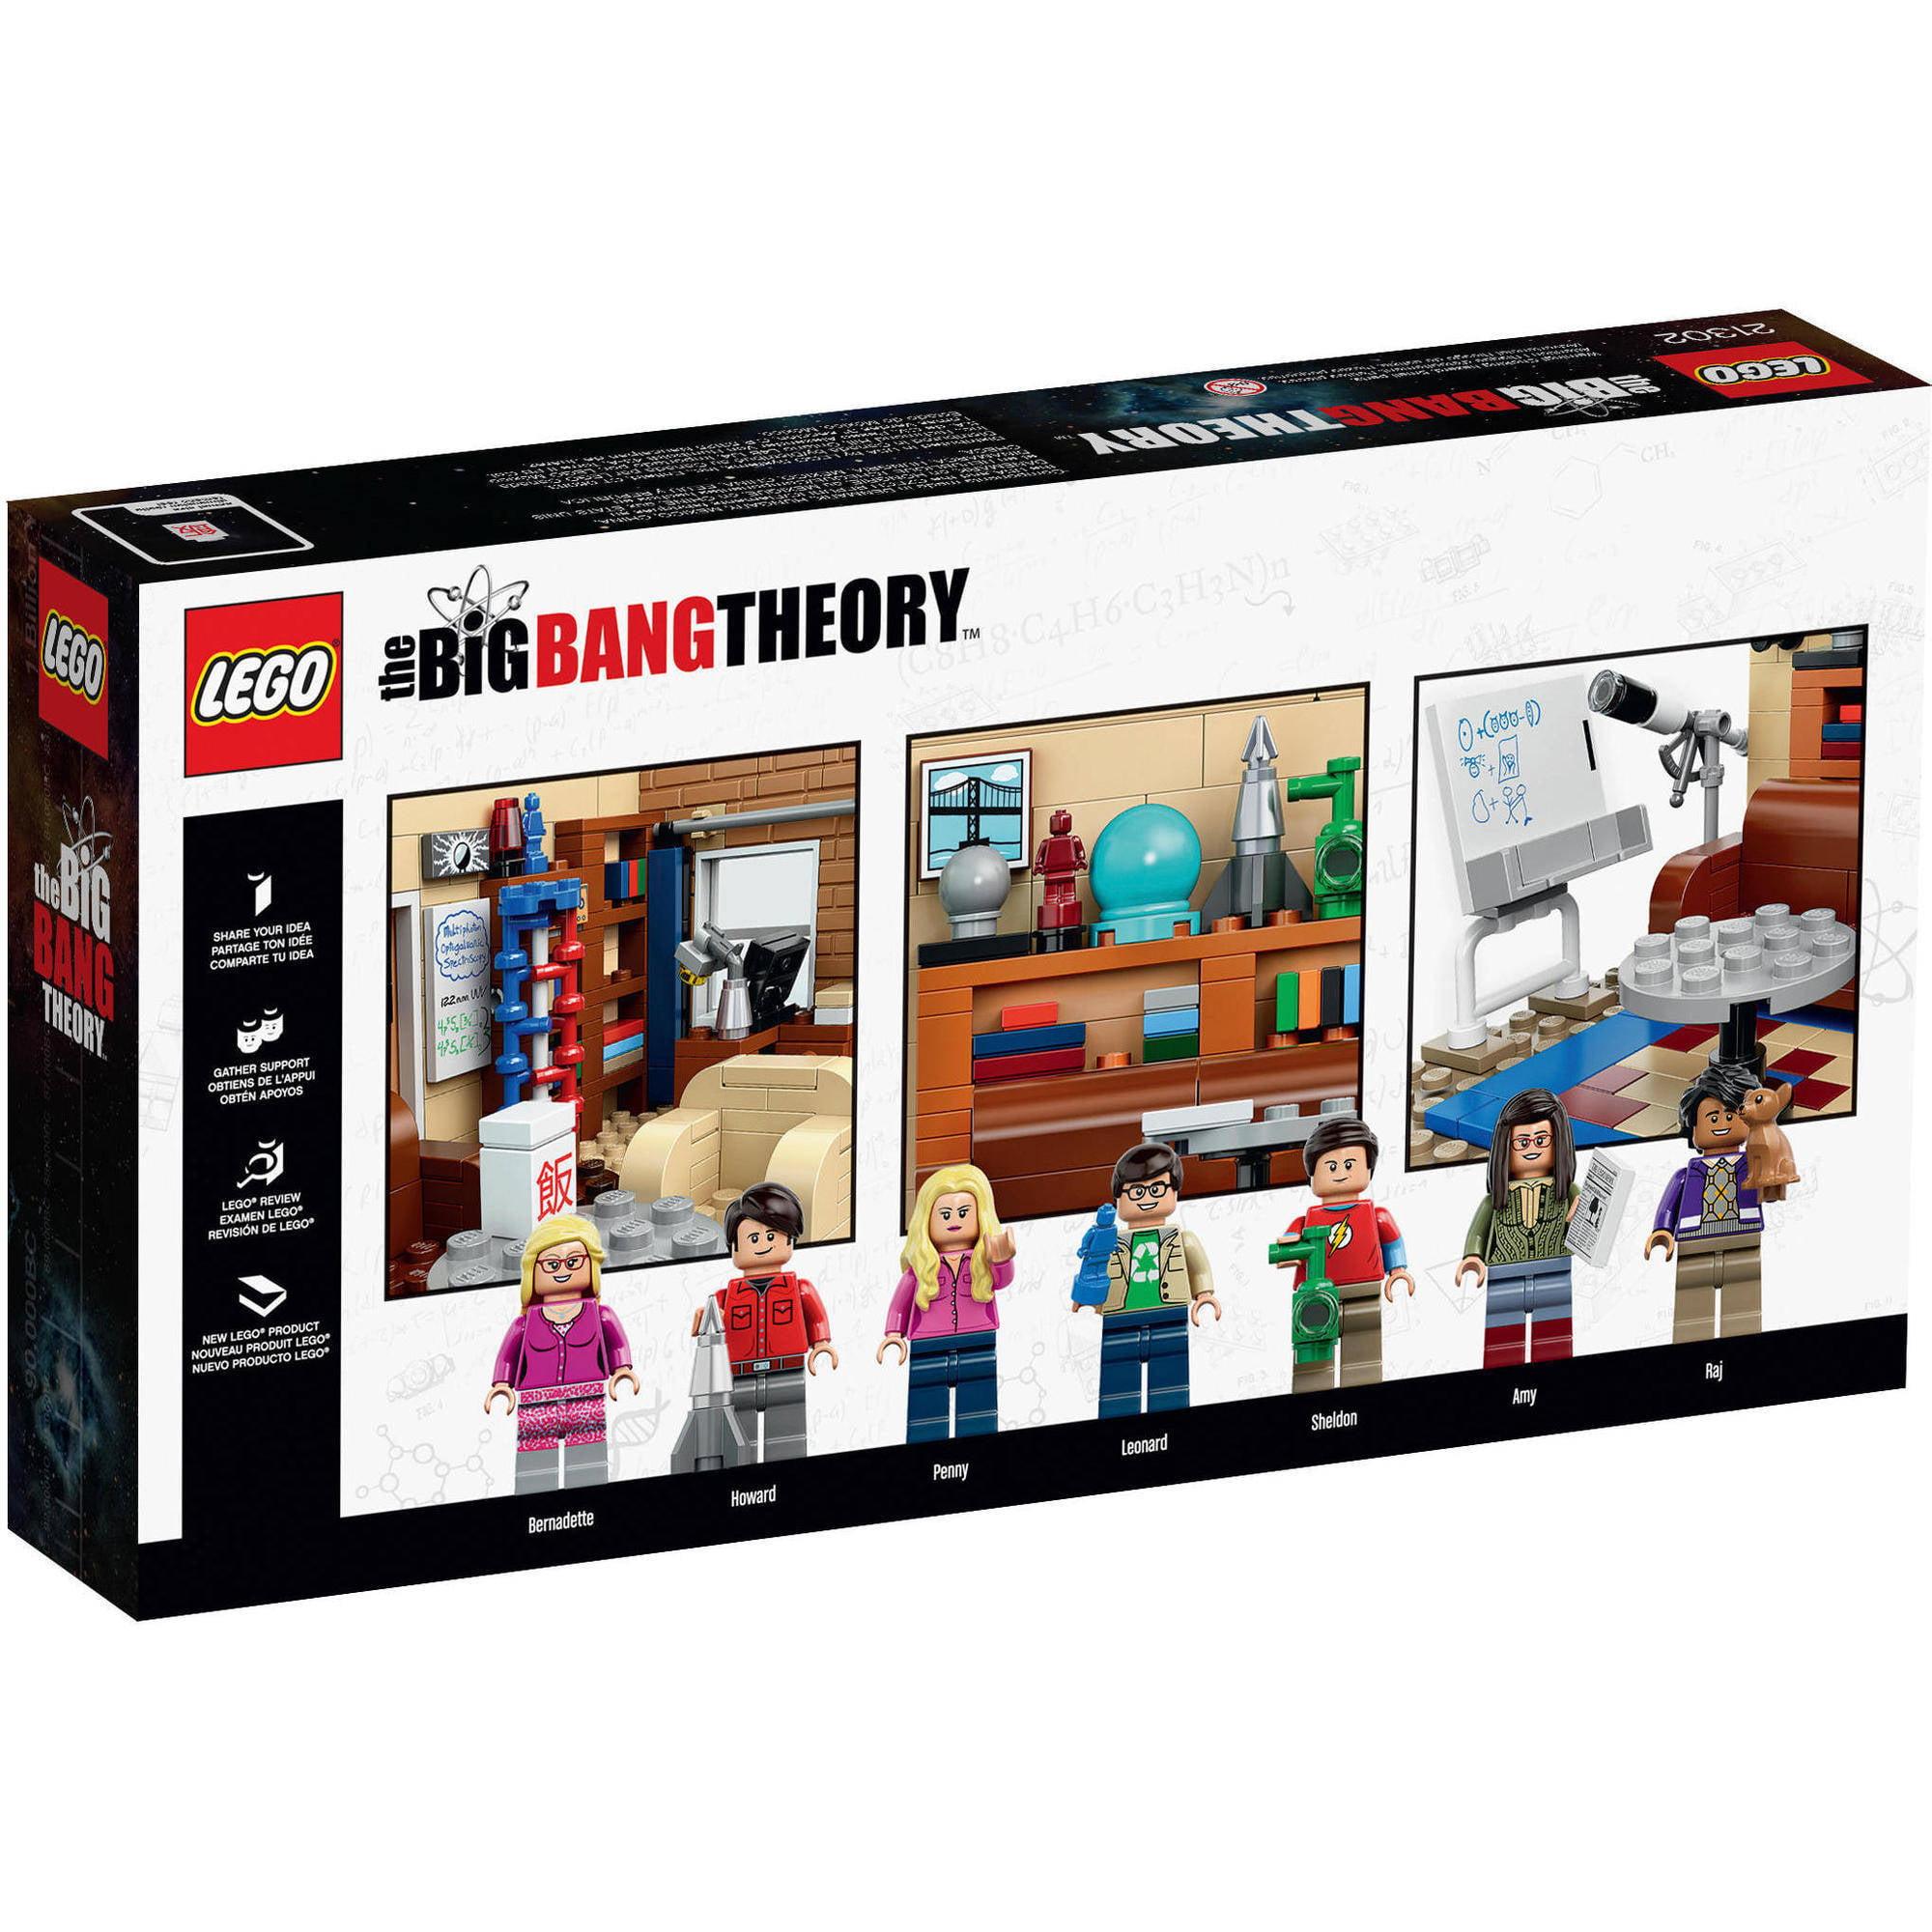 Lego Ideas The Big Bang Theory 21302 Walmart Com